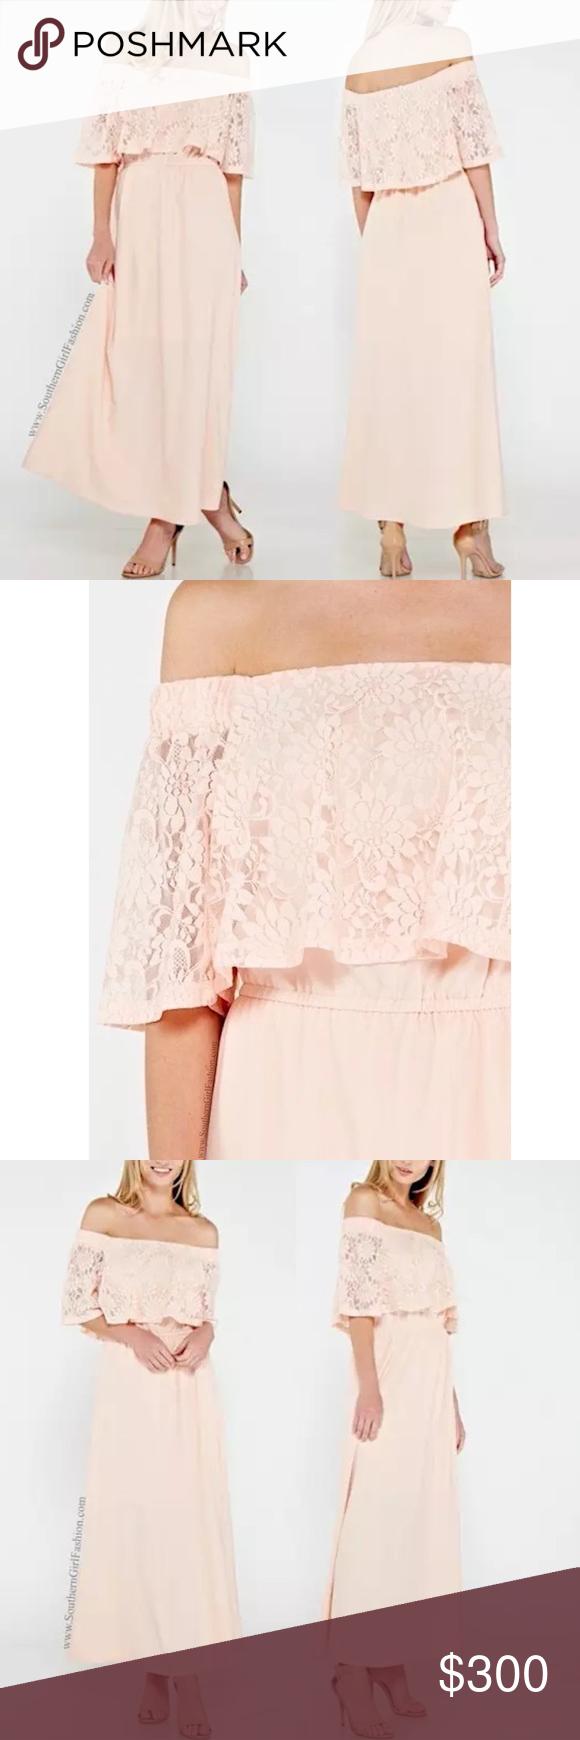 M boutique lace dress  FLORAL MAXI Off the Shoulder Long Draped Lace Gown Boutique  Busted